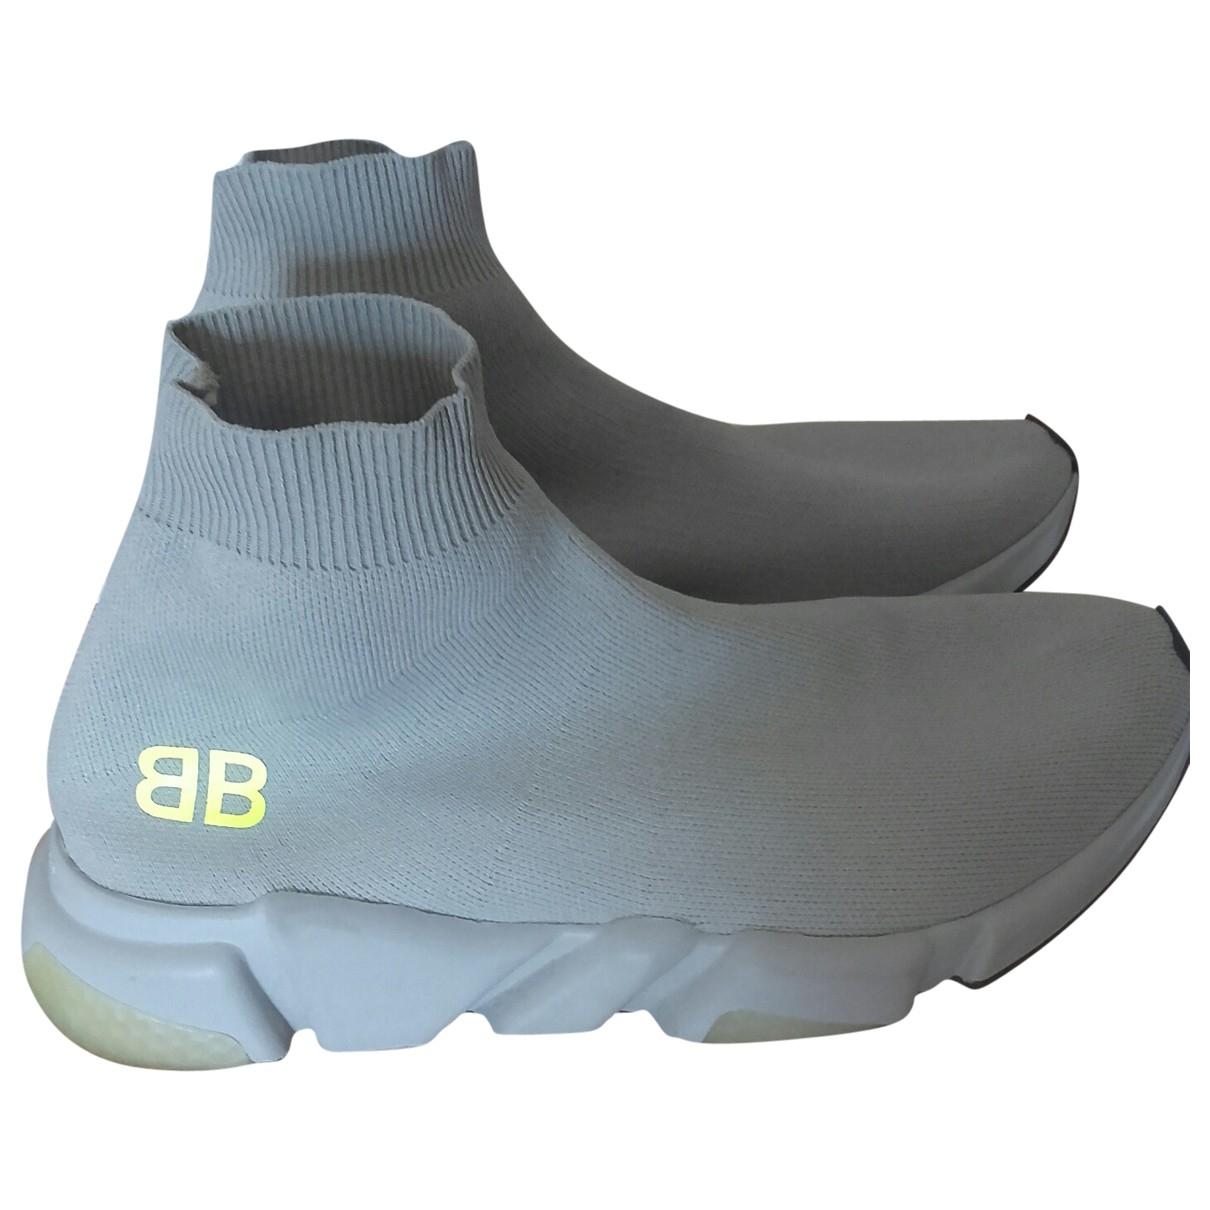 Balenciaga - Baskets Speed pour femme en toile - gris